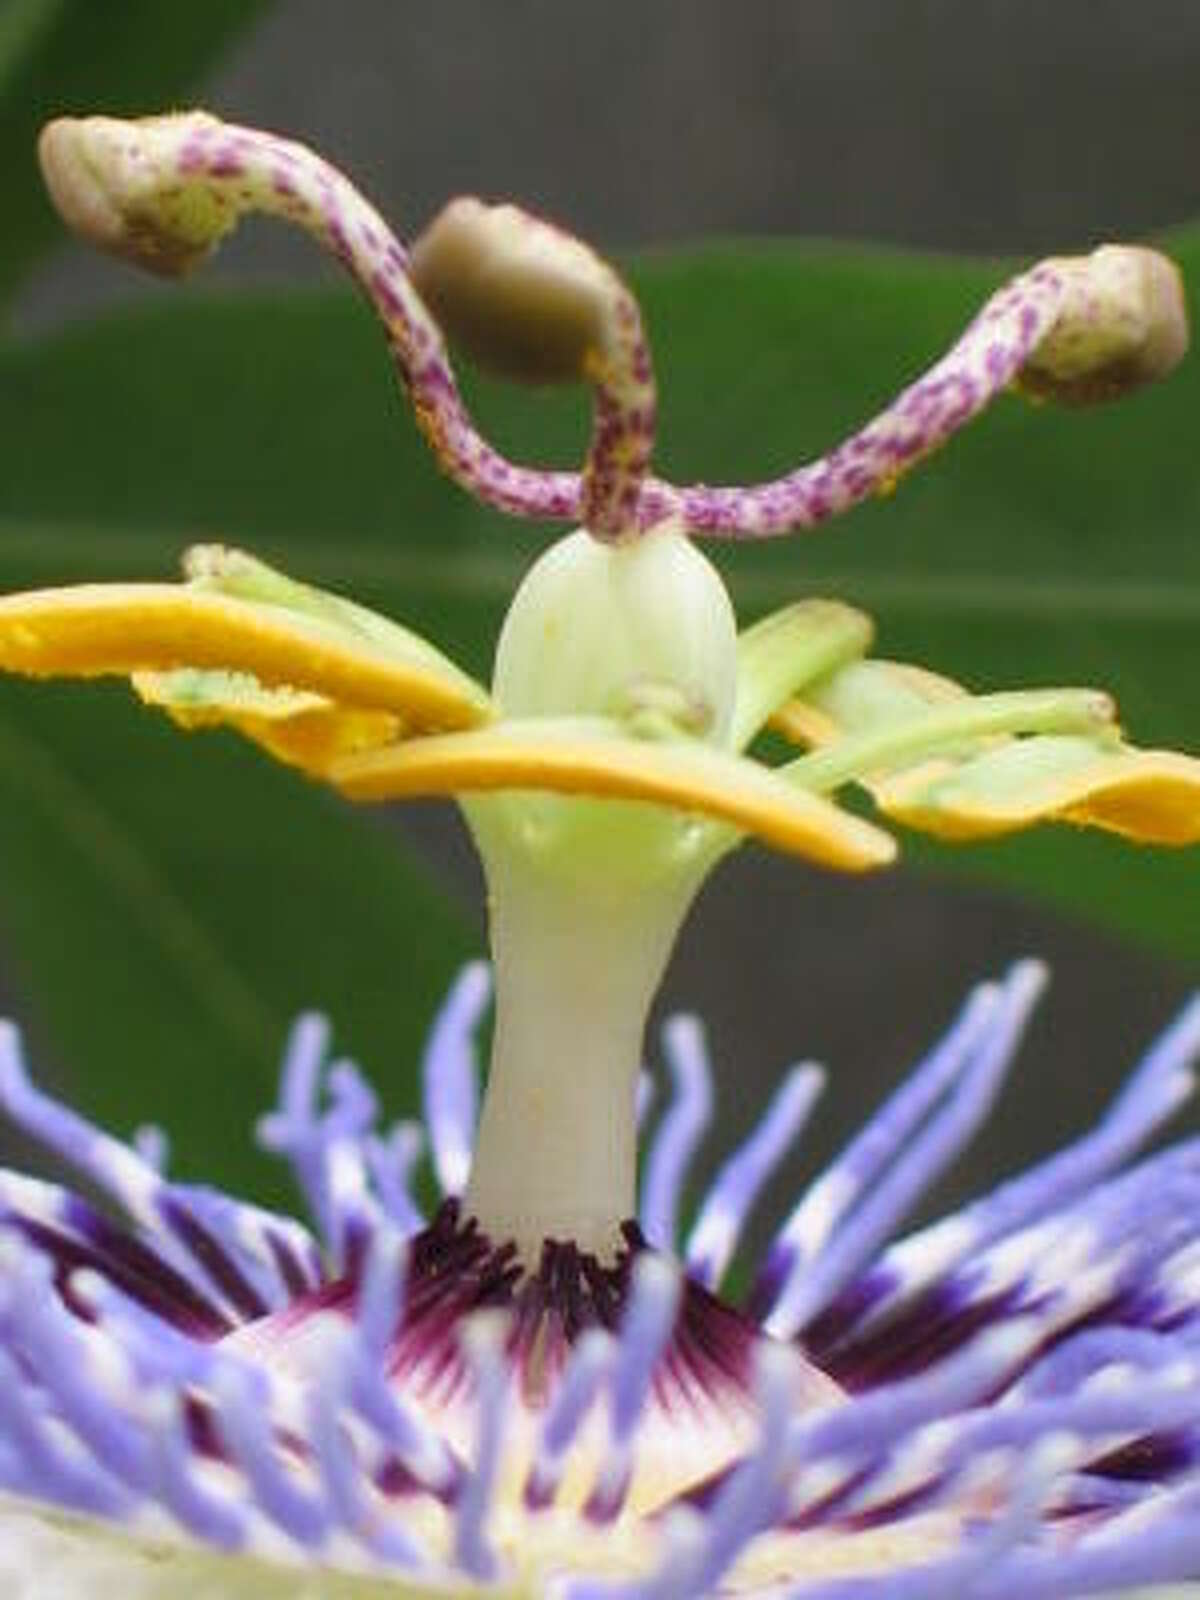 Passionflower closeup. Database passionflowers | Lazy Gardener on passiflora | HoustonGrows.com